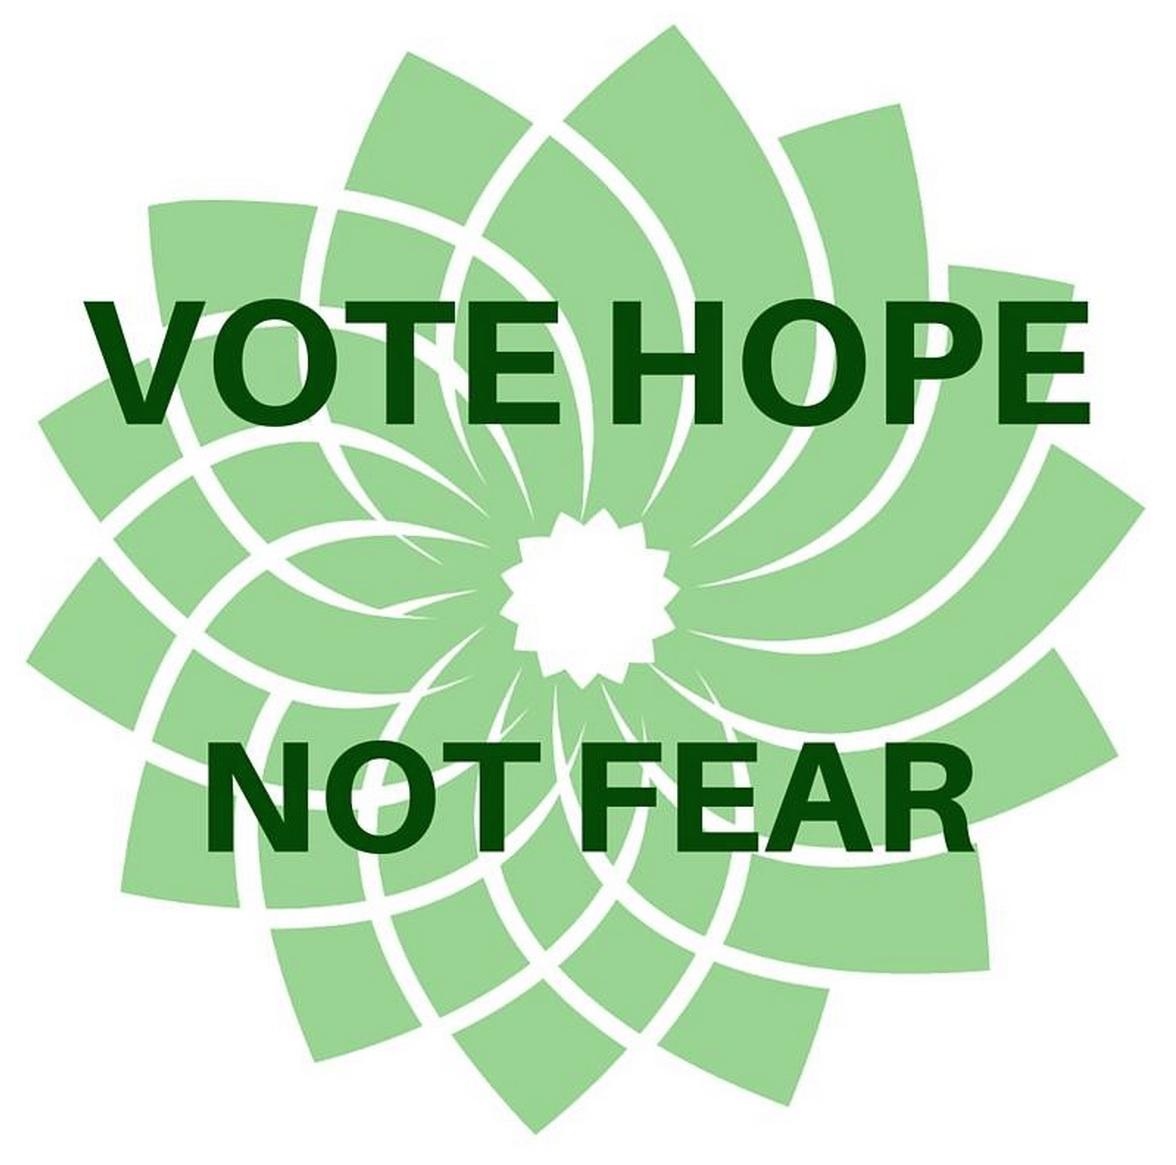 votehopenotfear.jpg